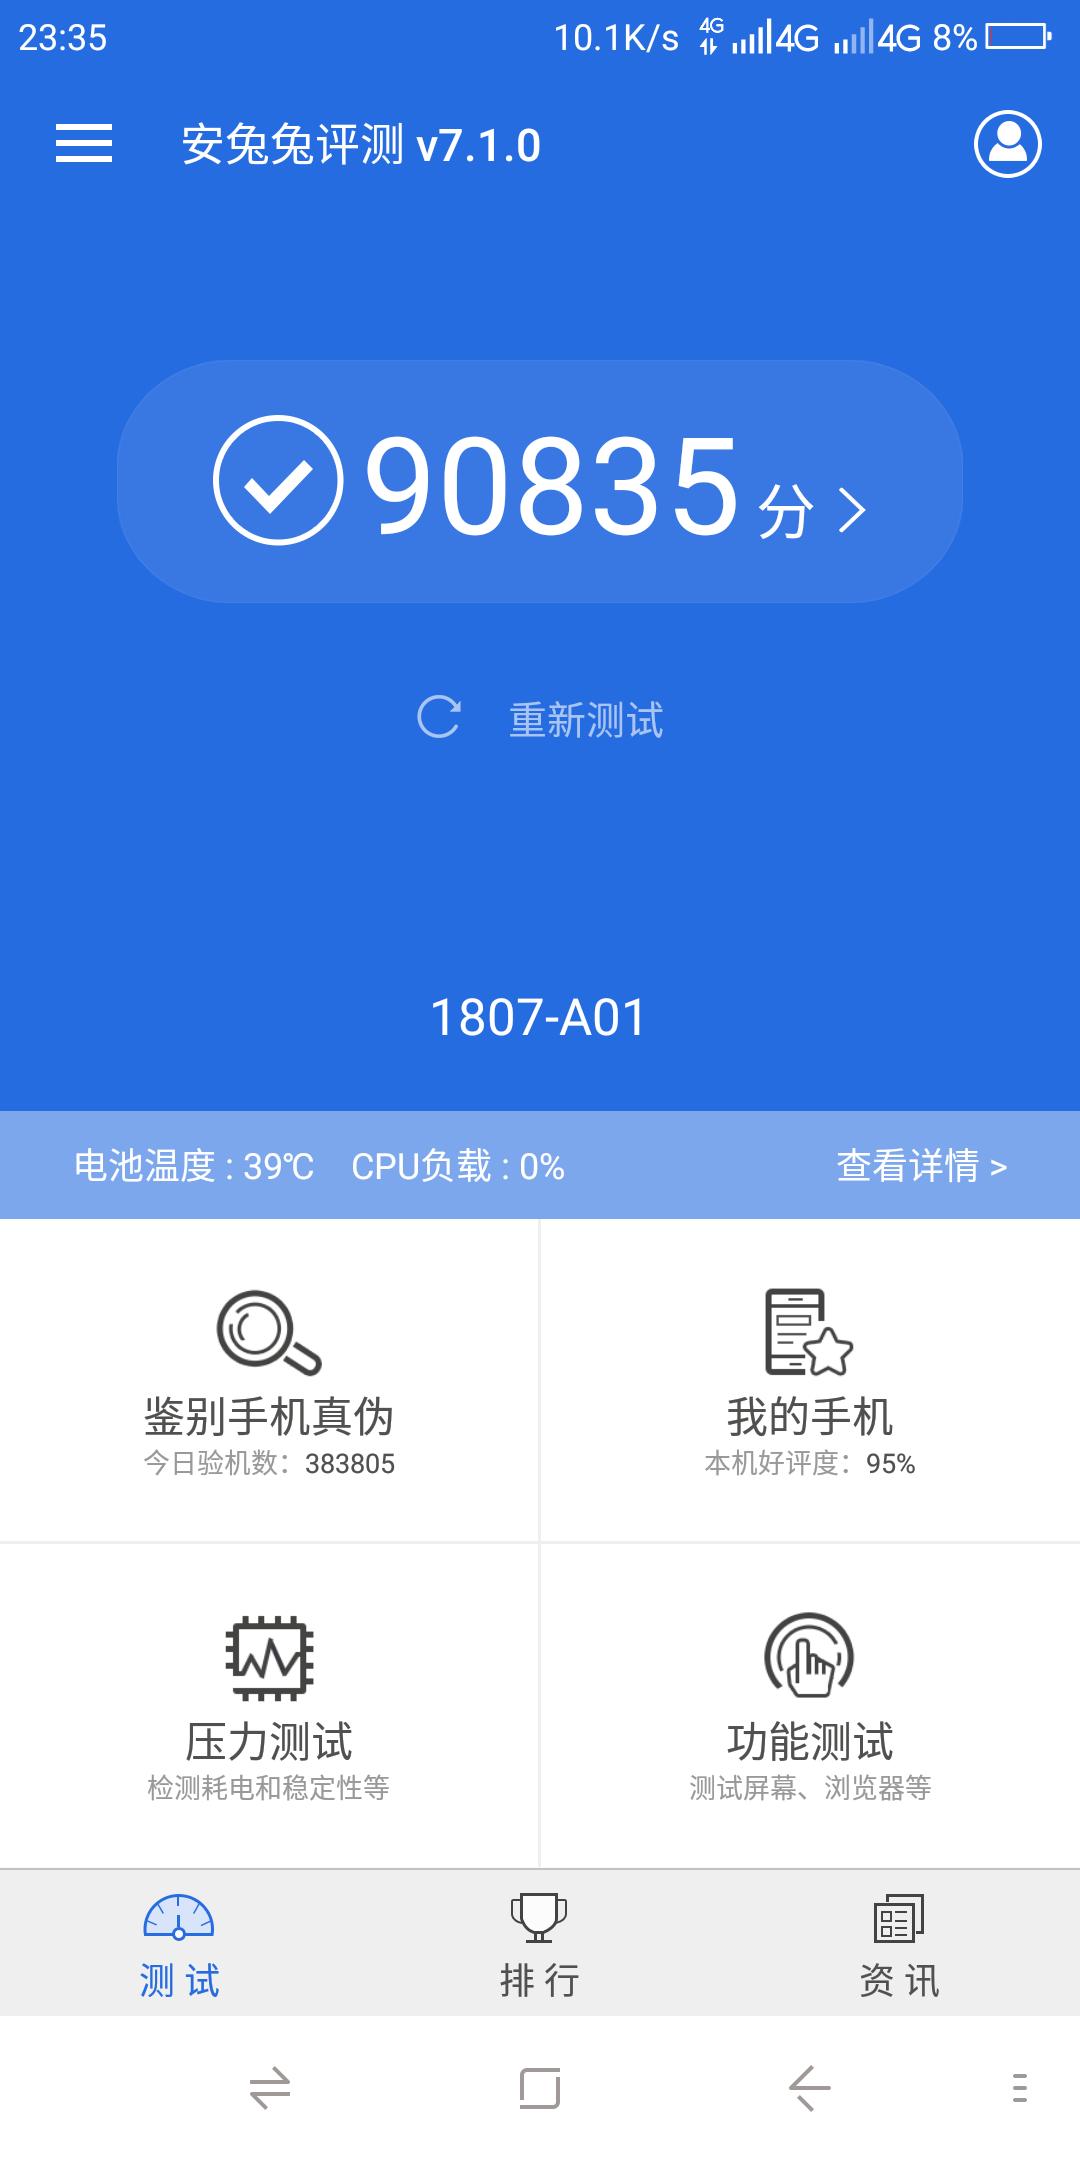 Screenshot_2018-05-28-23-35-40.png